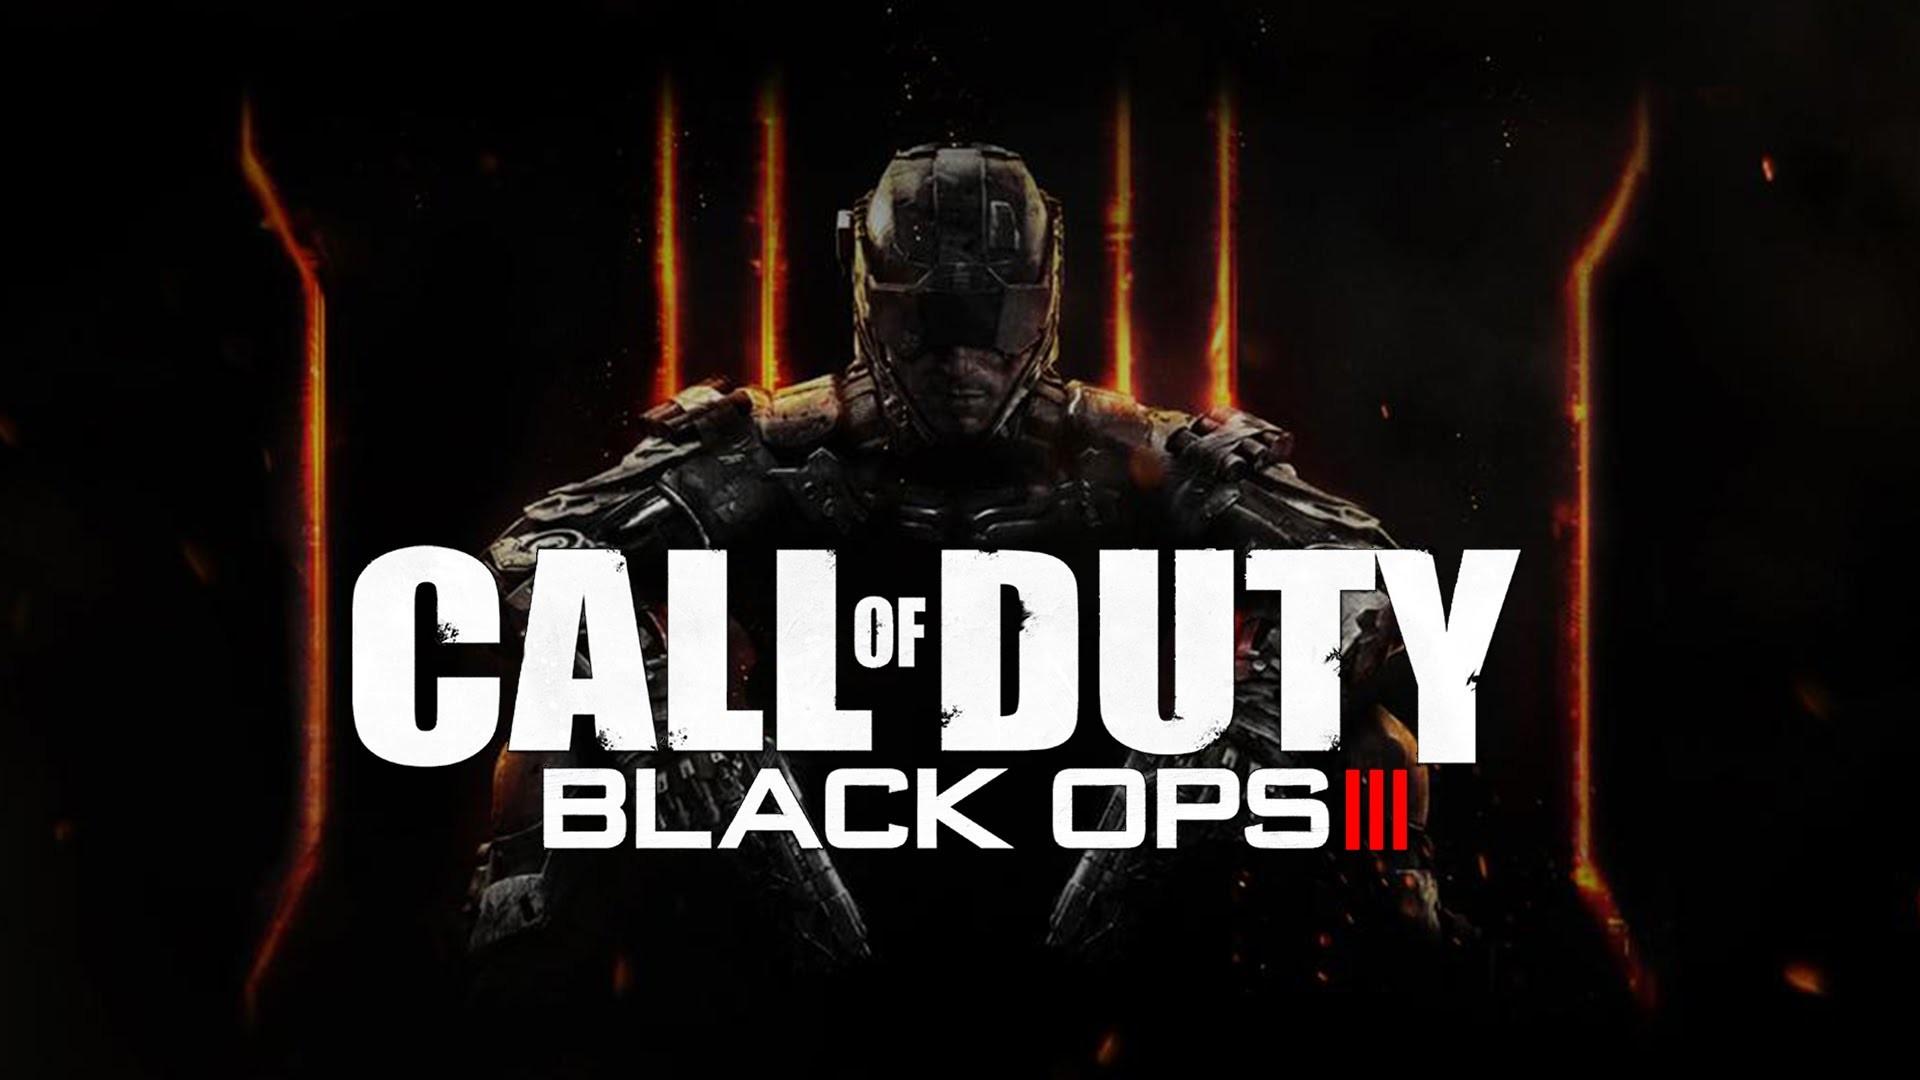 Art ID 81470 3840x2160 Download Call Of Duty Black Ops 3 Specialist Reaper